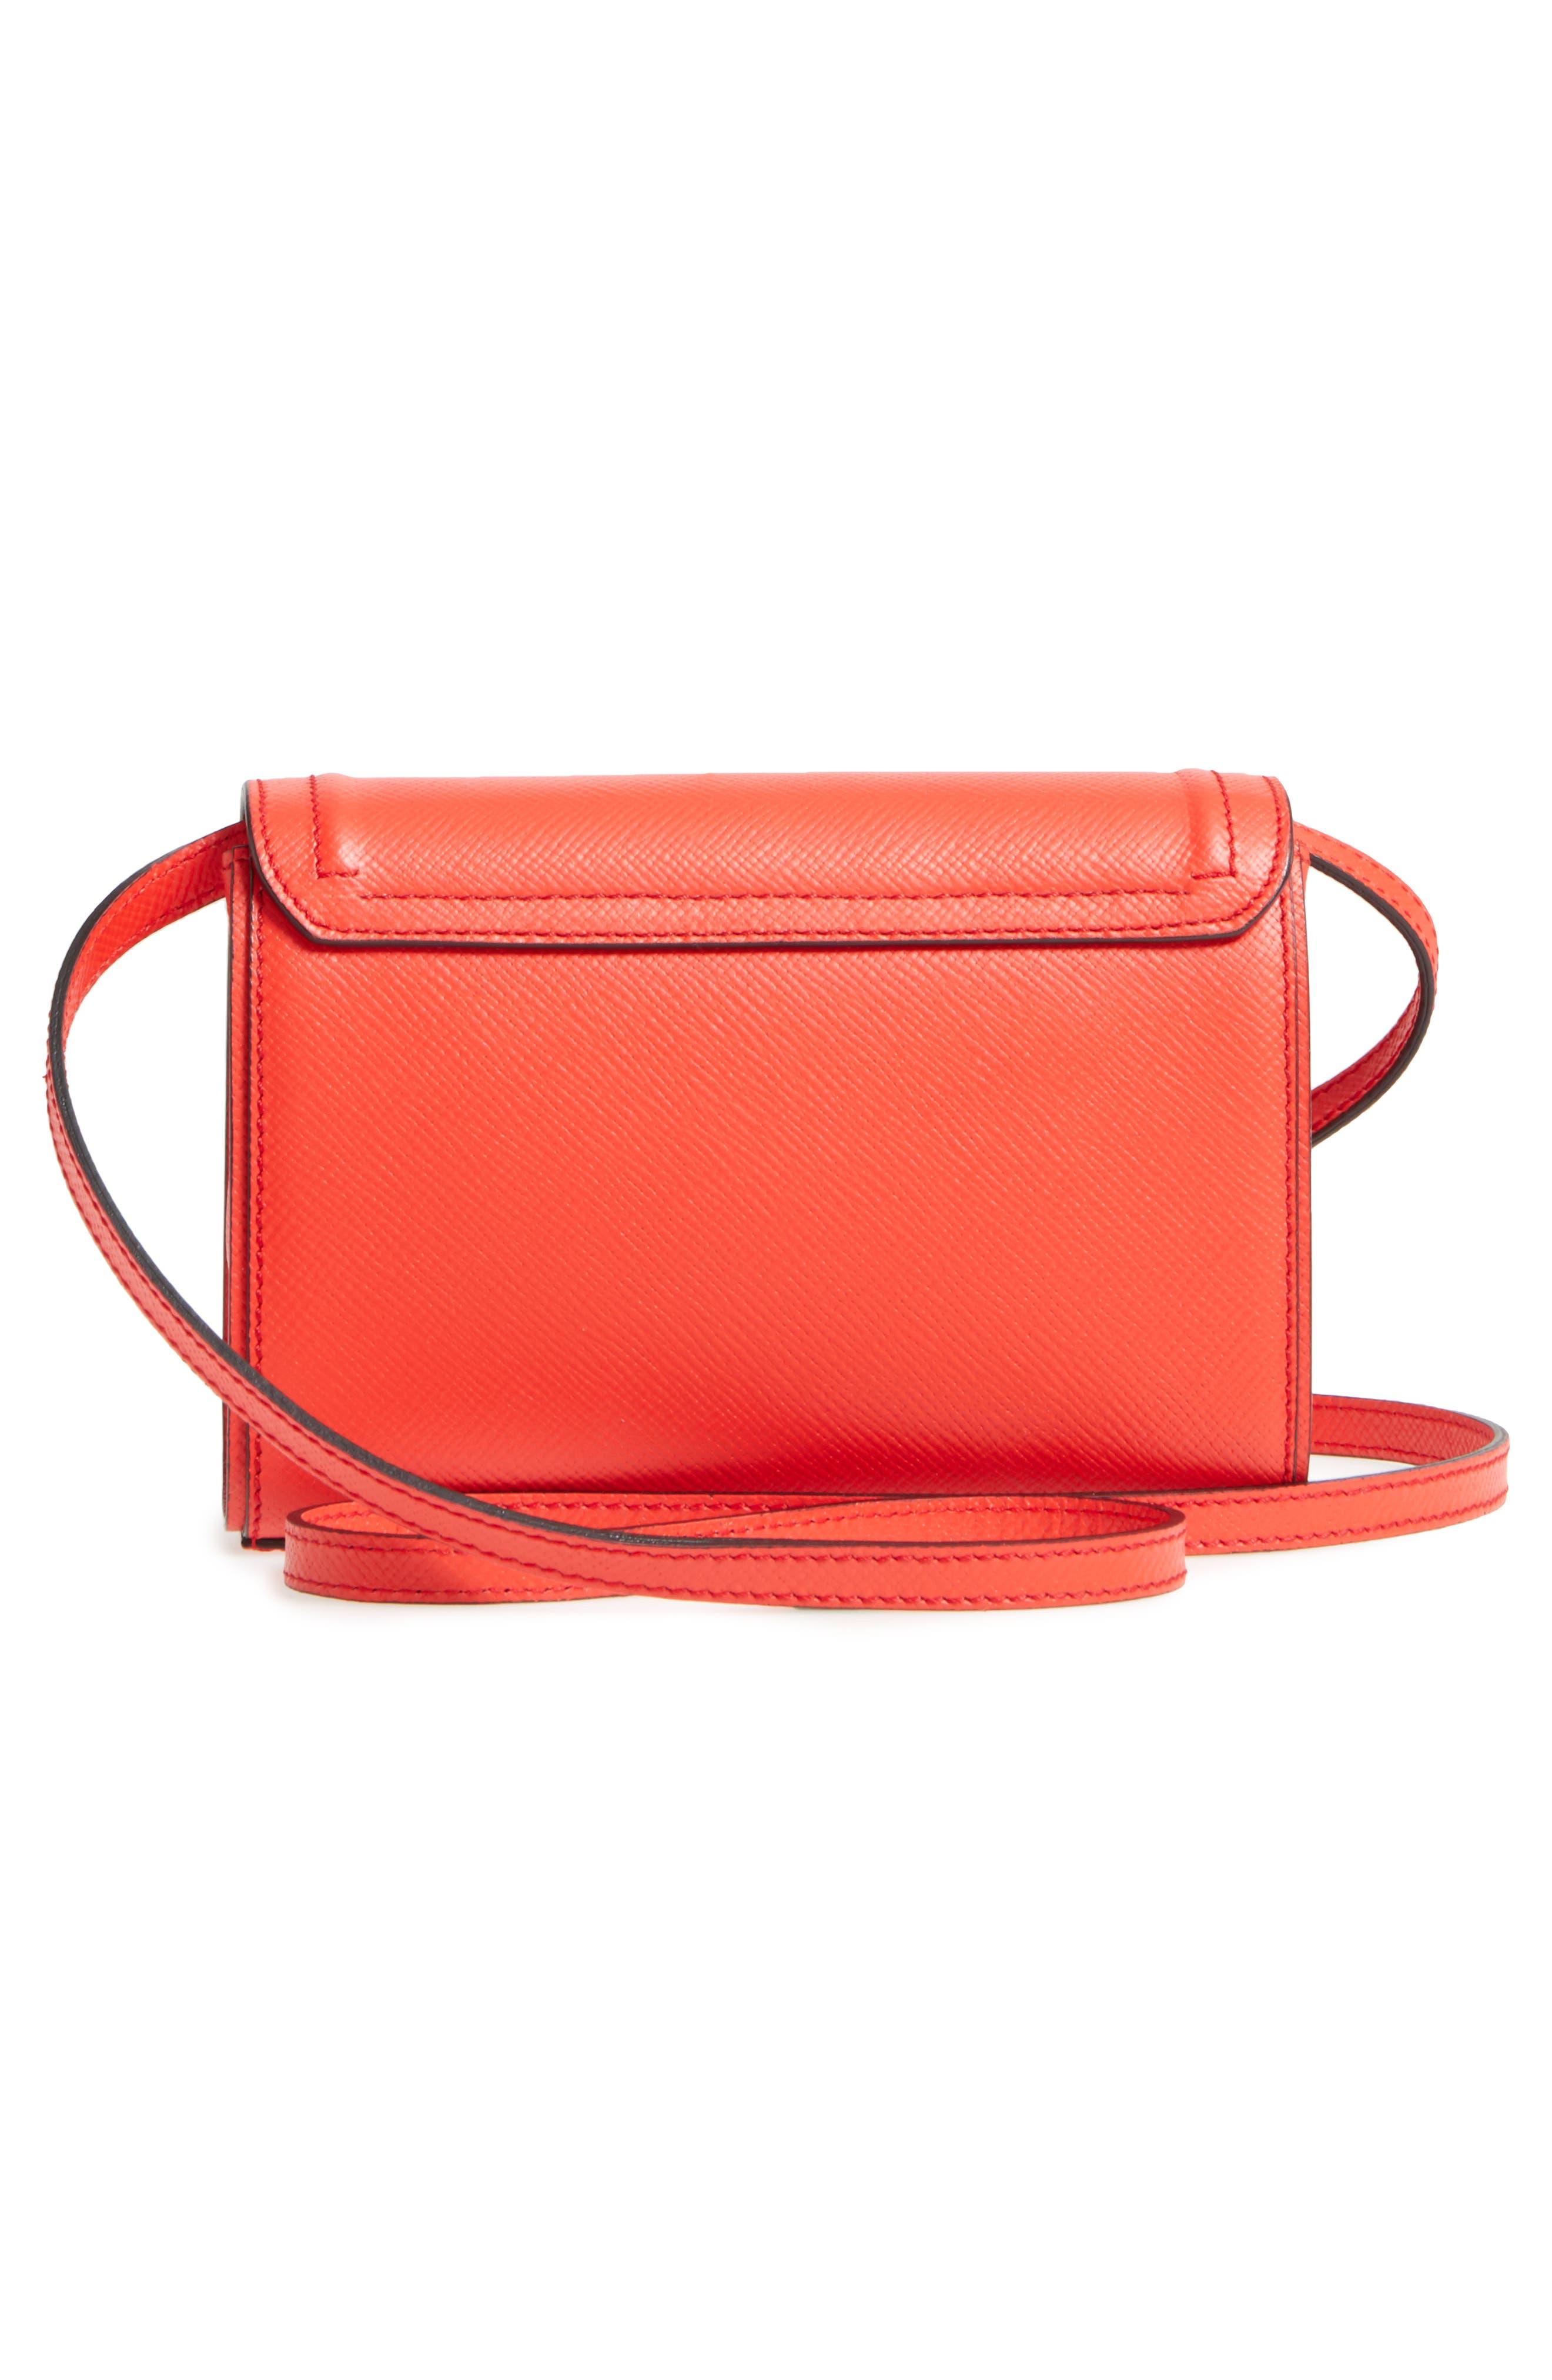 Mini Ilenea Leather Crossbody Bag,                             Alternate thumbnail 3, color,                             Coral Red